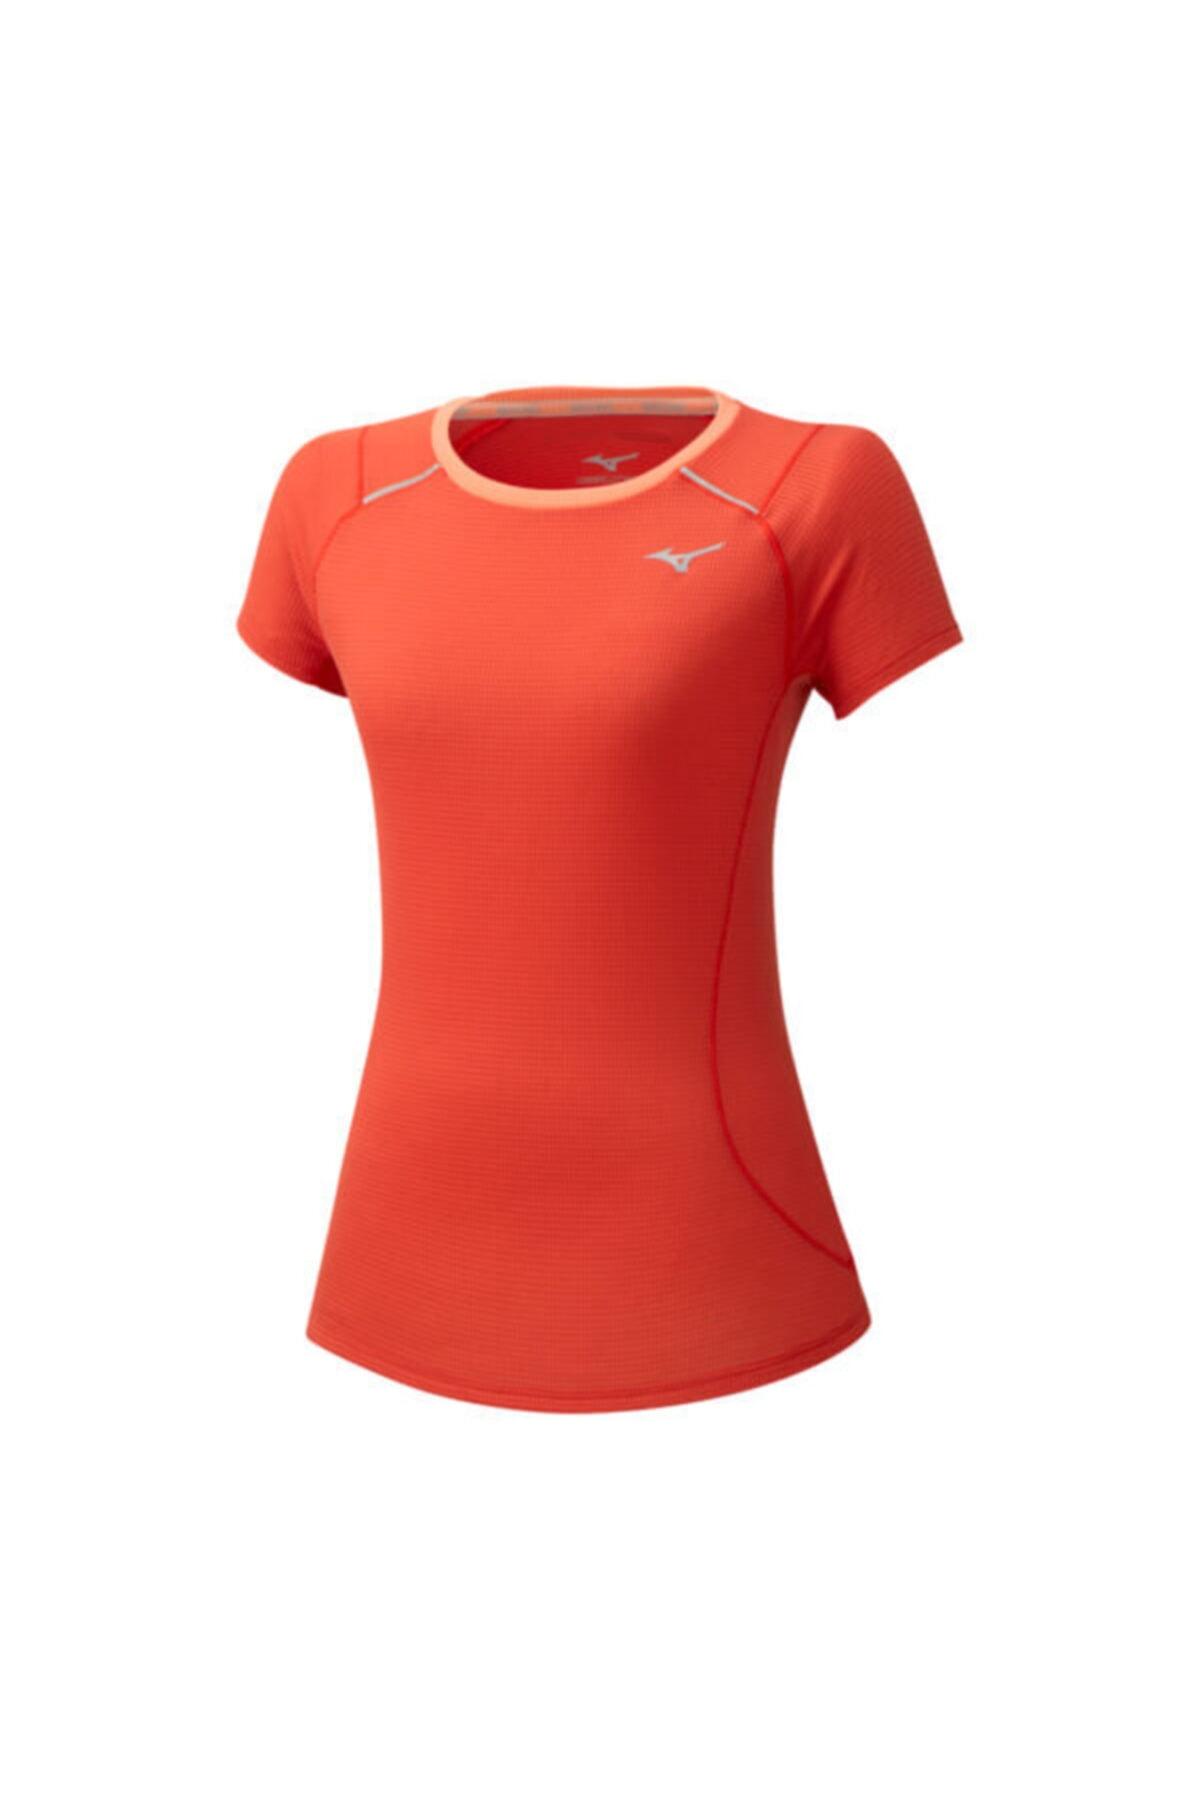 MIZUNO Dry Aeroflow Tee Kadın Turuncu T-shirt 1